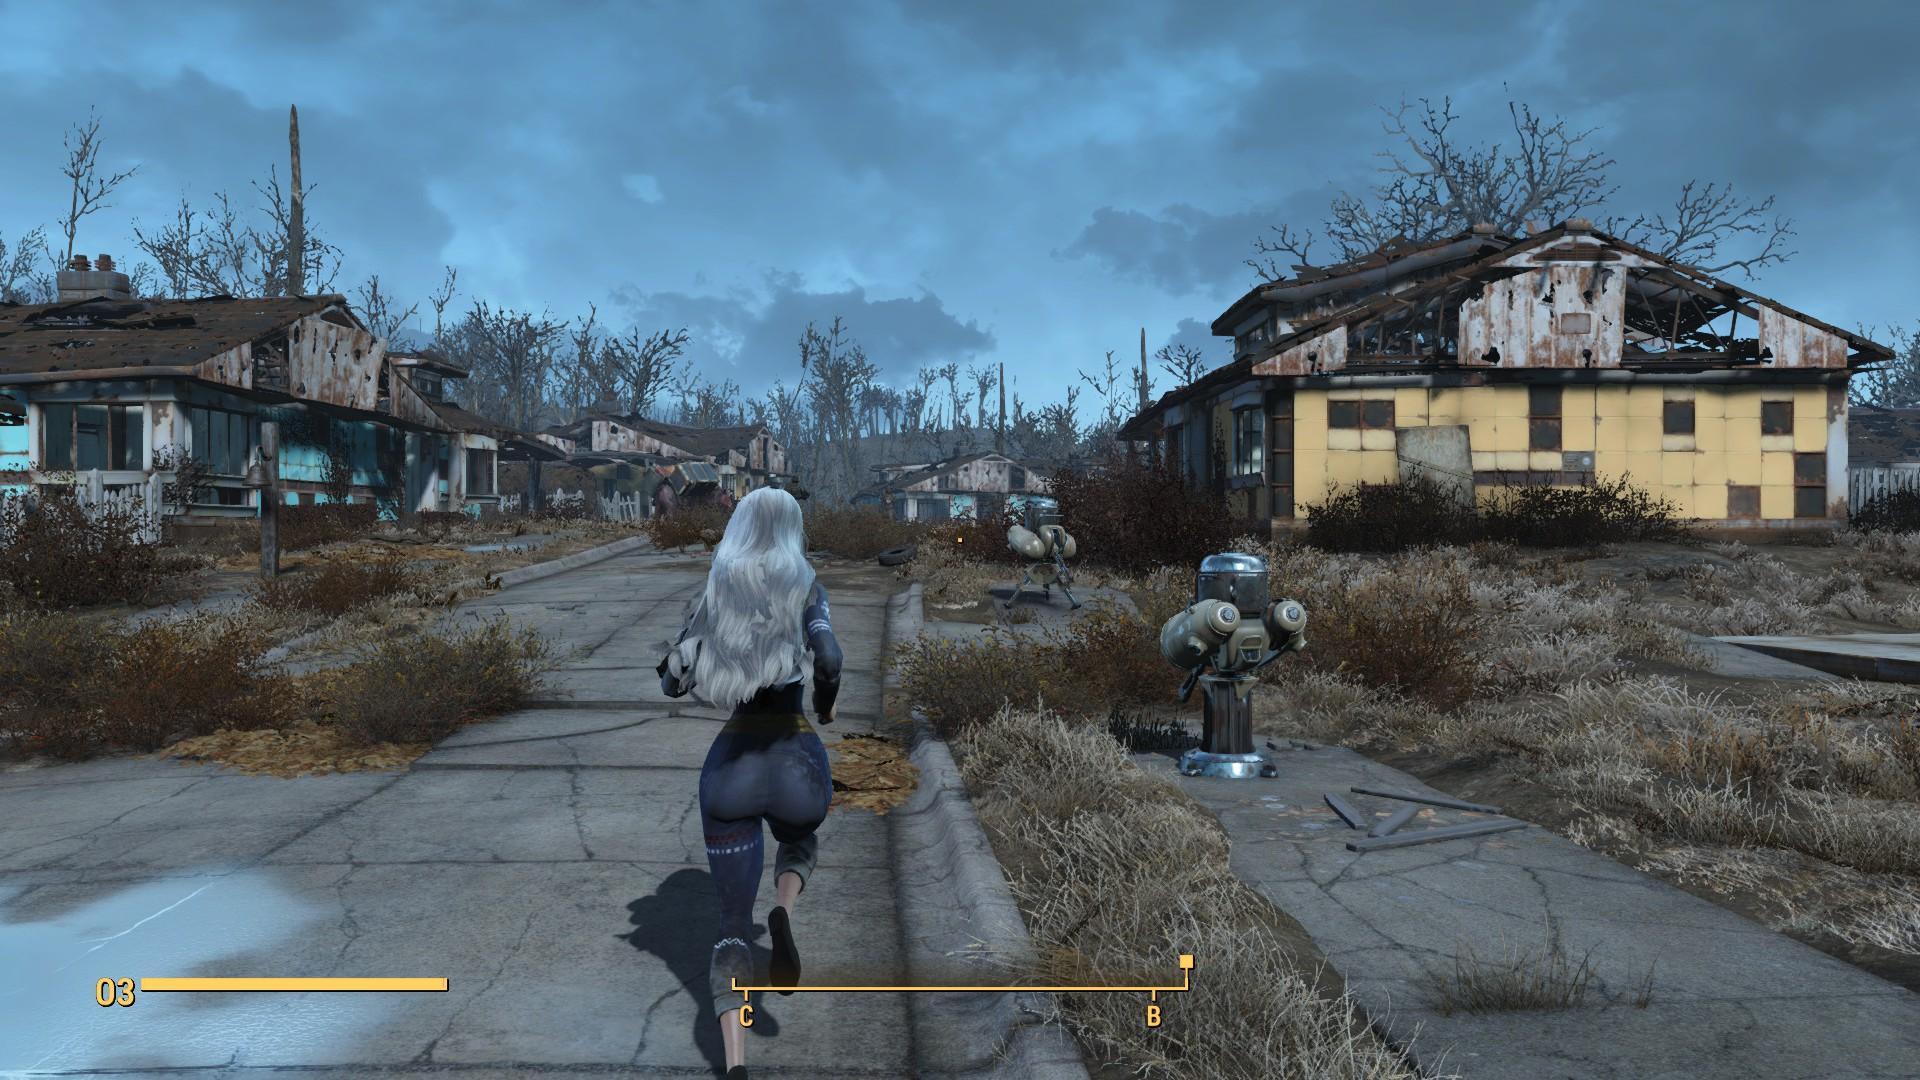 Противница бодипозитива в поисках сына - Fallout 4